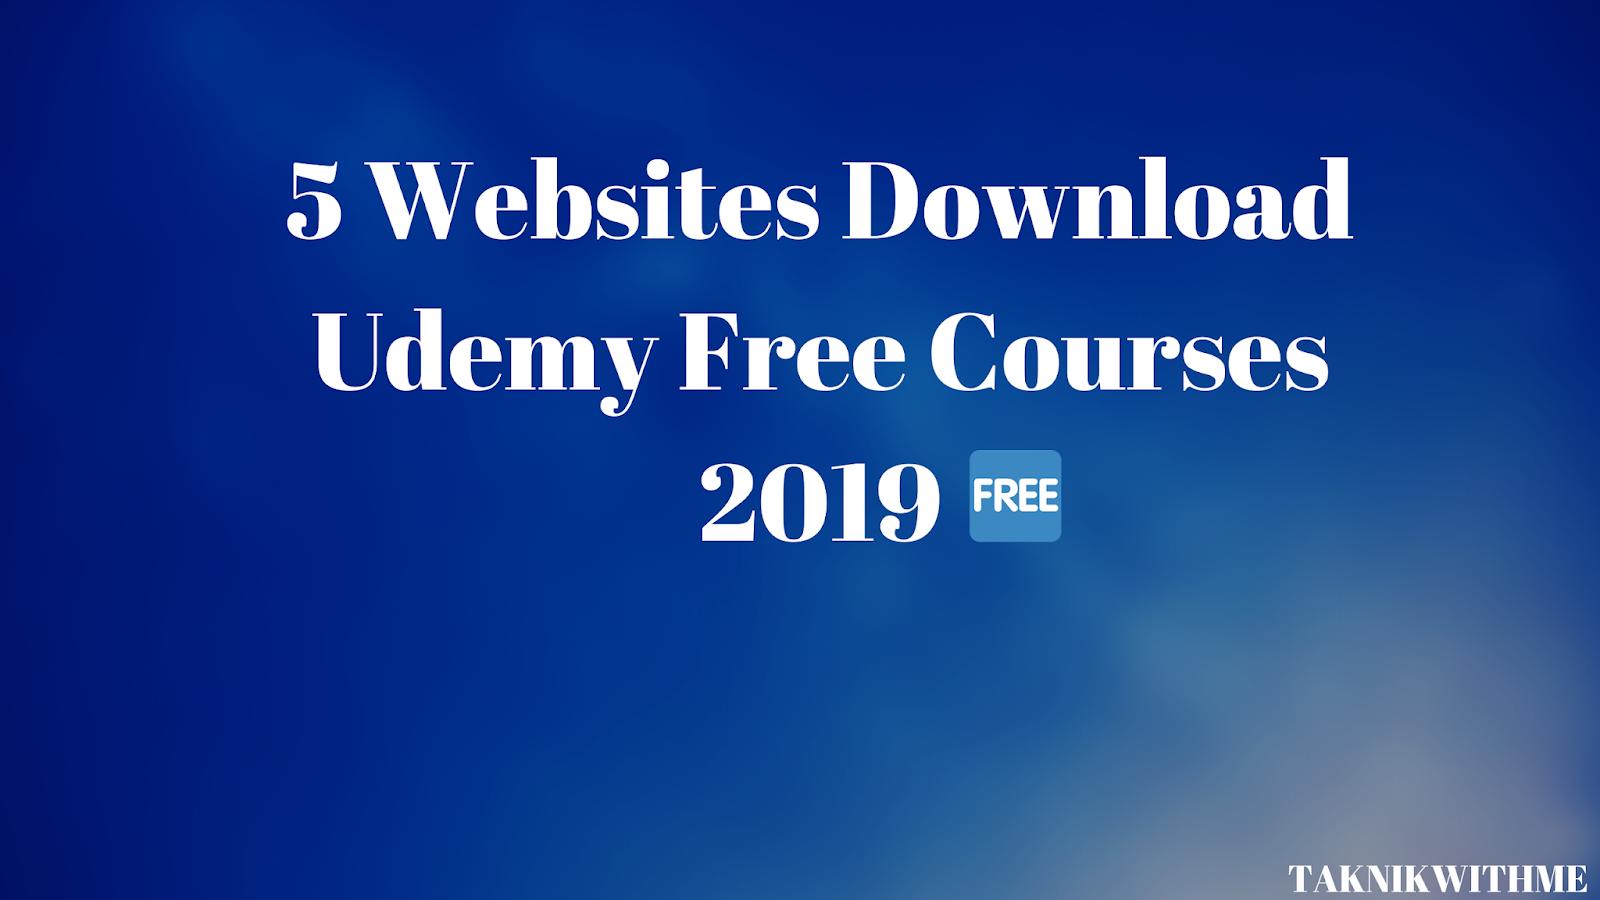 TaknikWithMe-Internet Gyan: 5 Websites Download Udemy Free